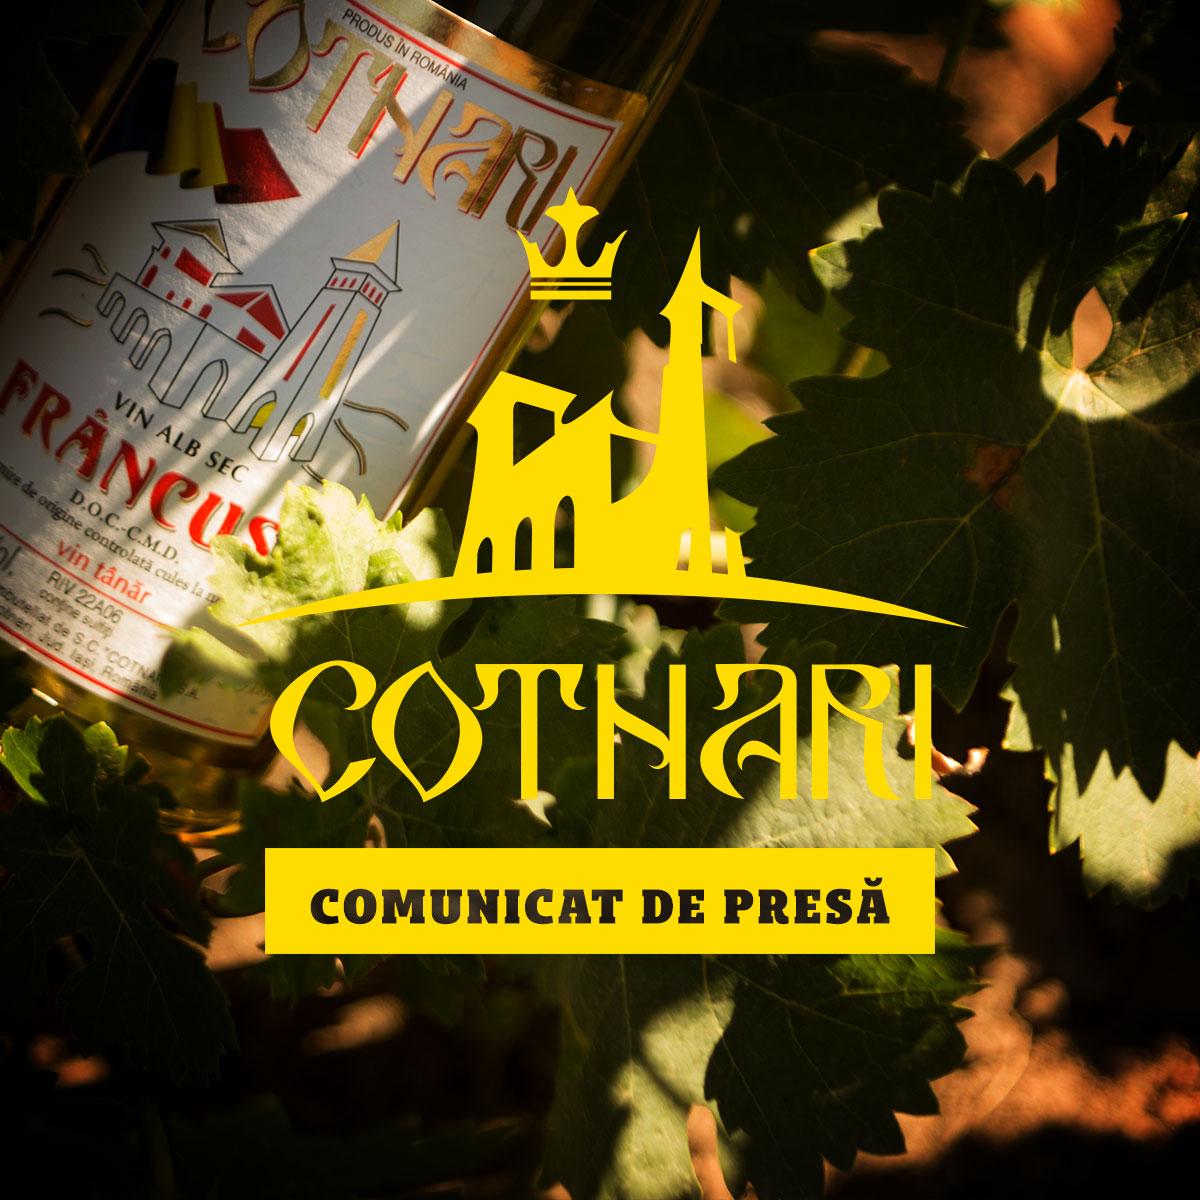 https://www.cotnari.ro/continut/uploads/2017/08/comunicat7.jpg